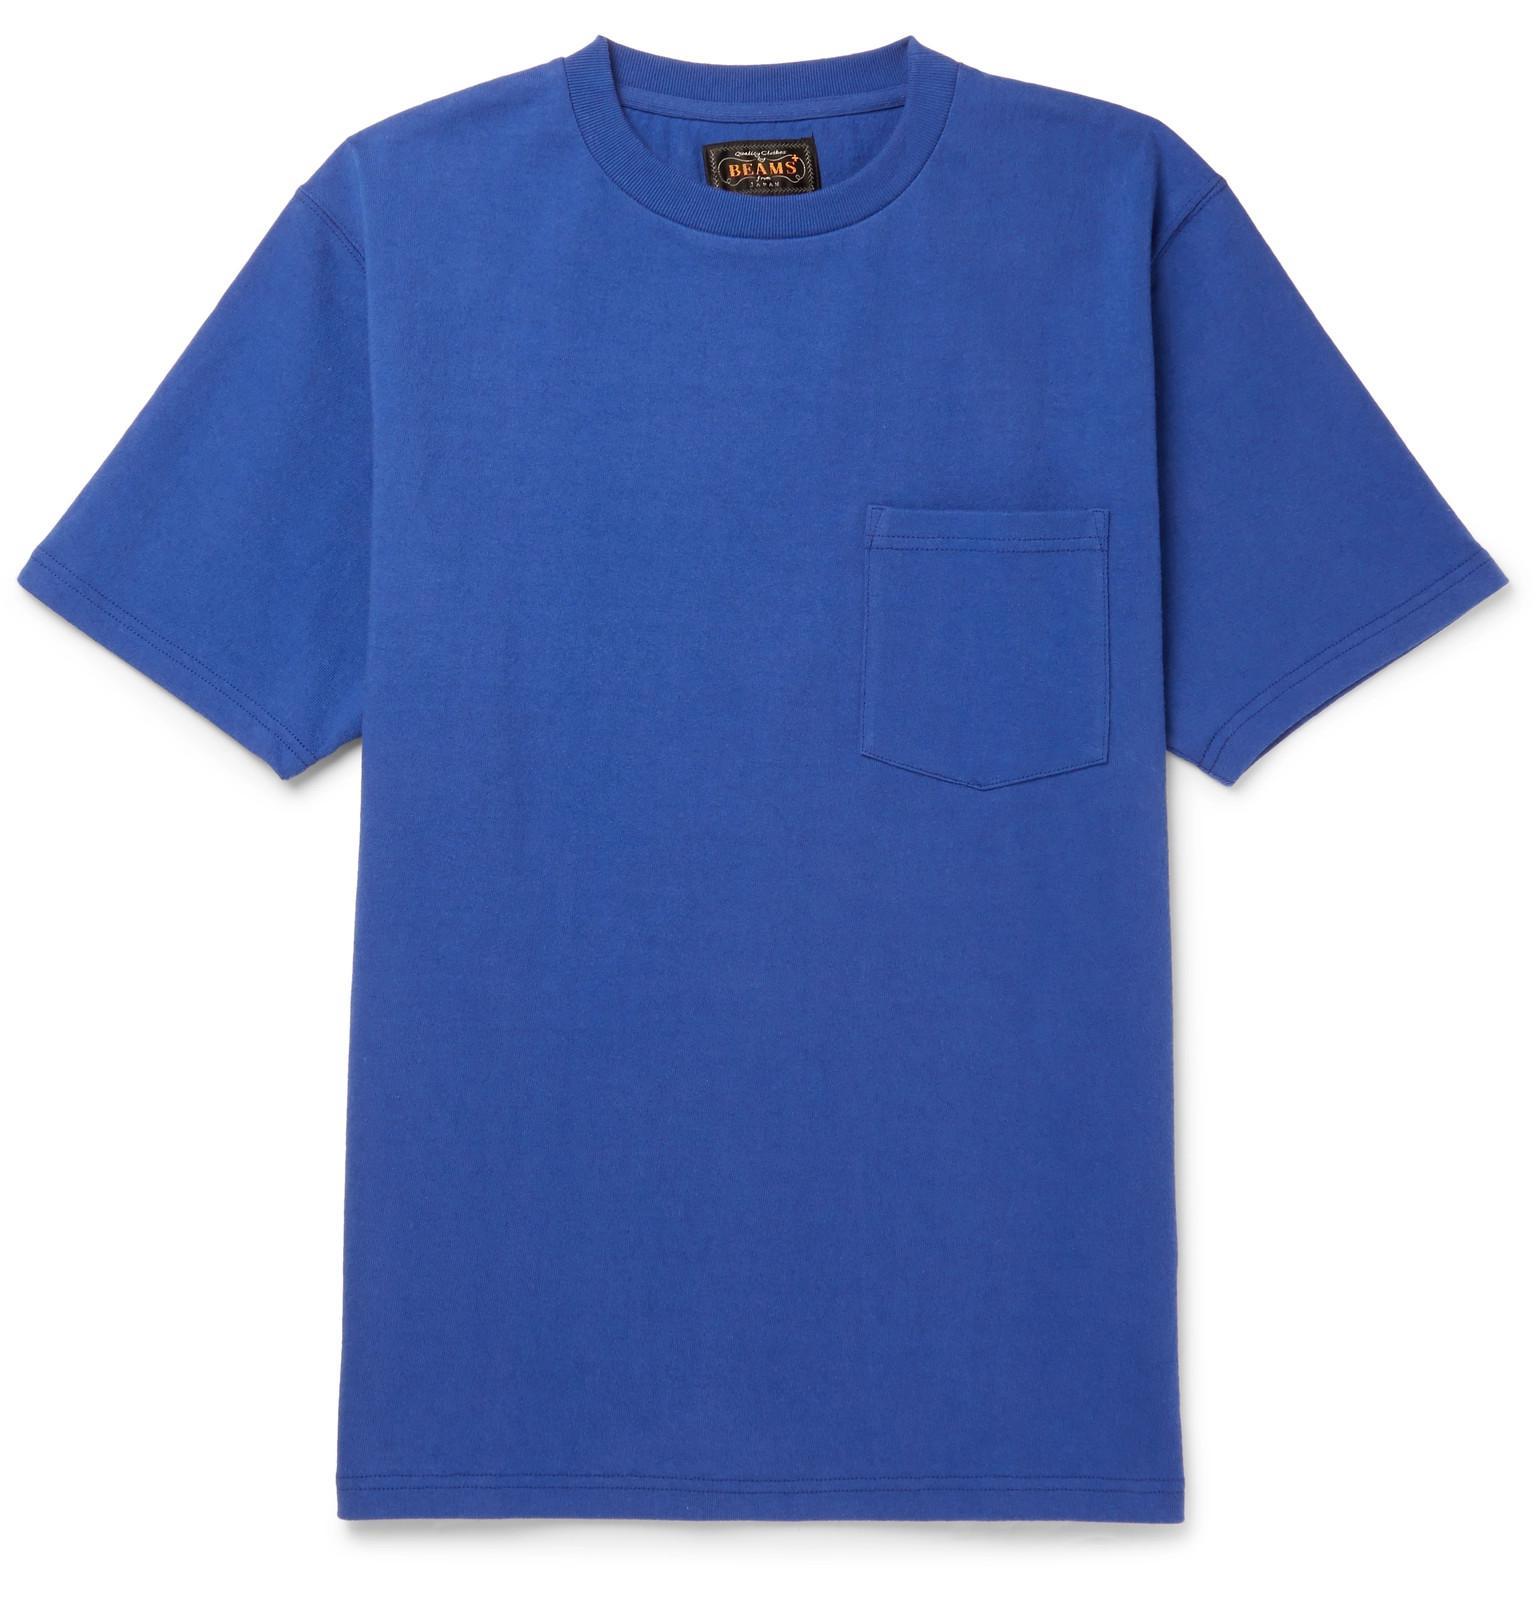 Beams Cotton-jersey T-shirt - Royal blue DsUY1A